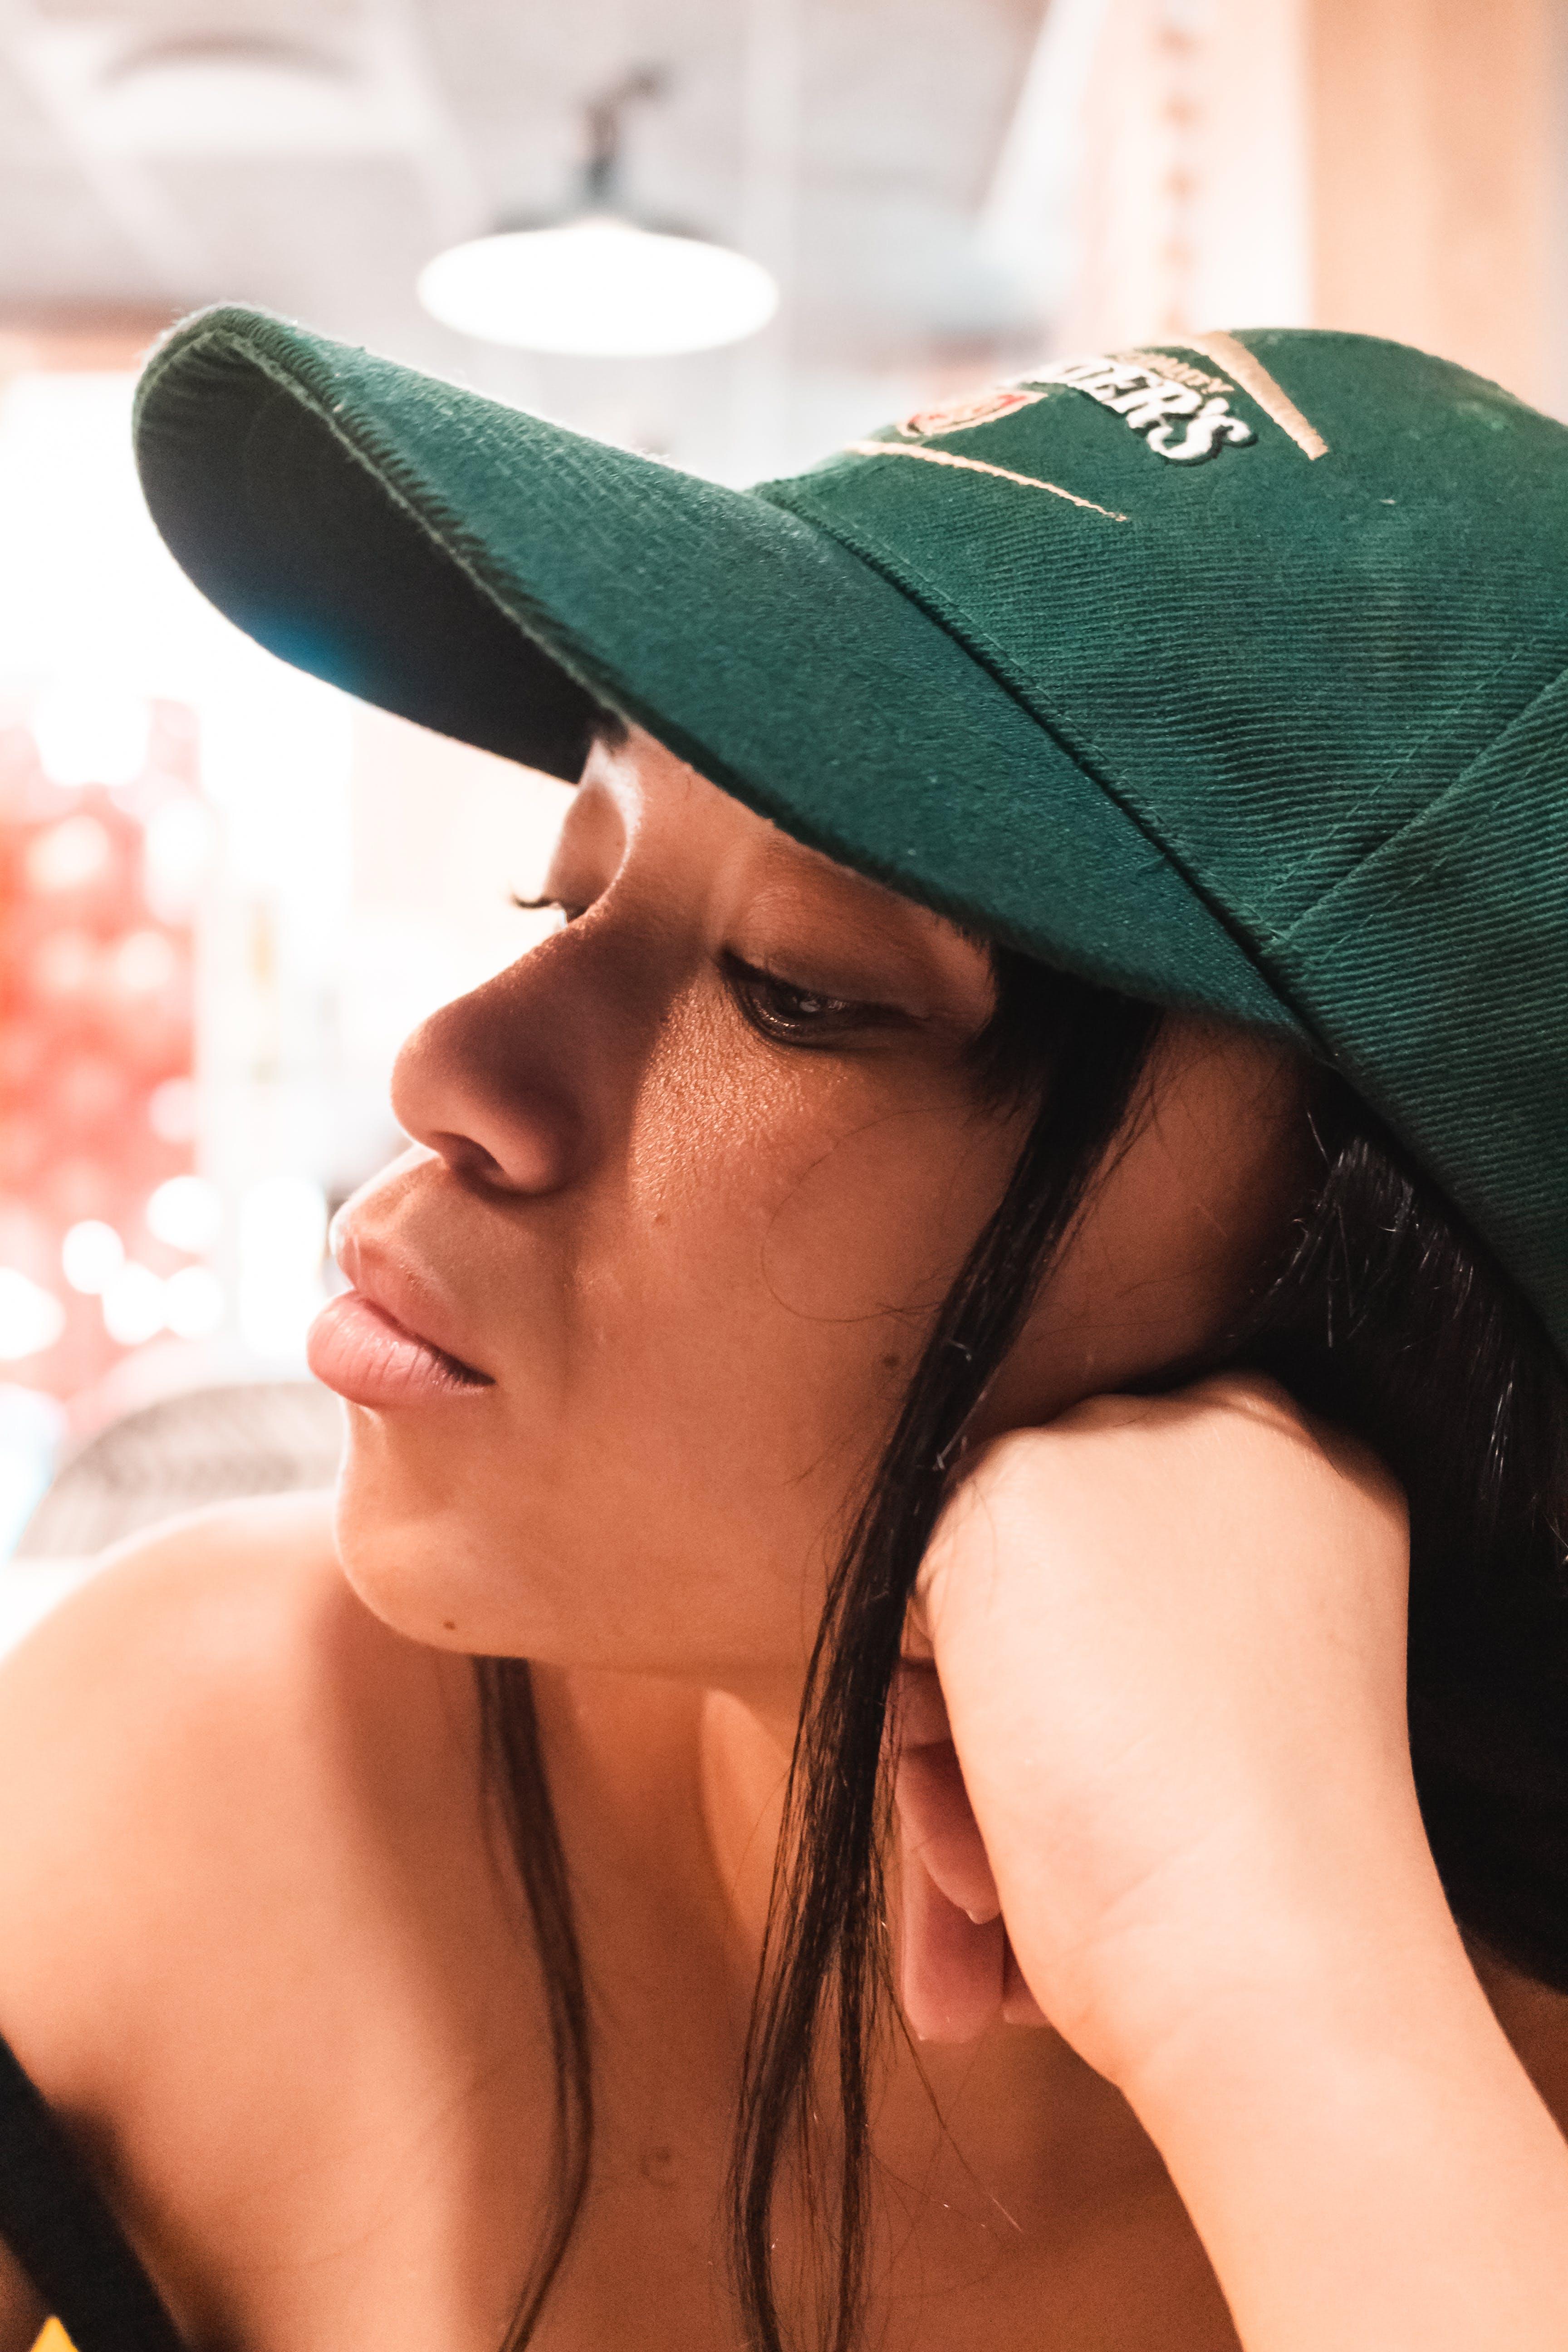 Close-up Photo Of Woman Wearing Cap